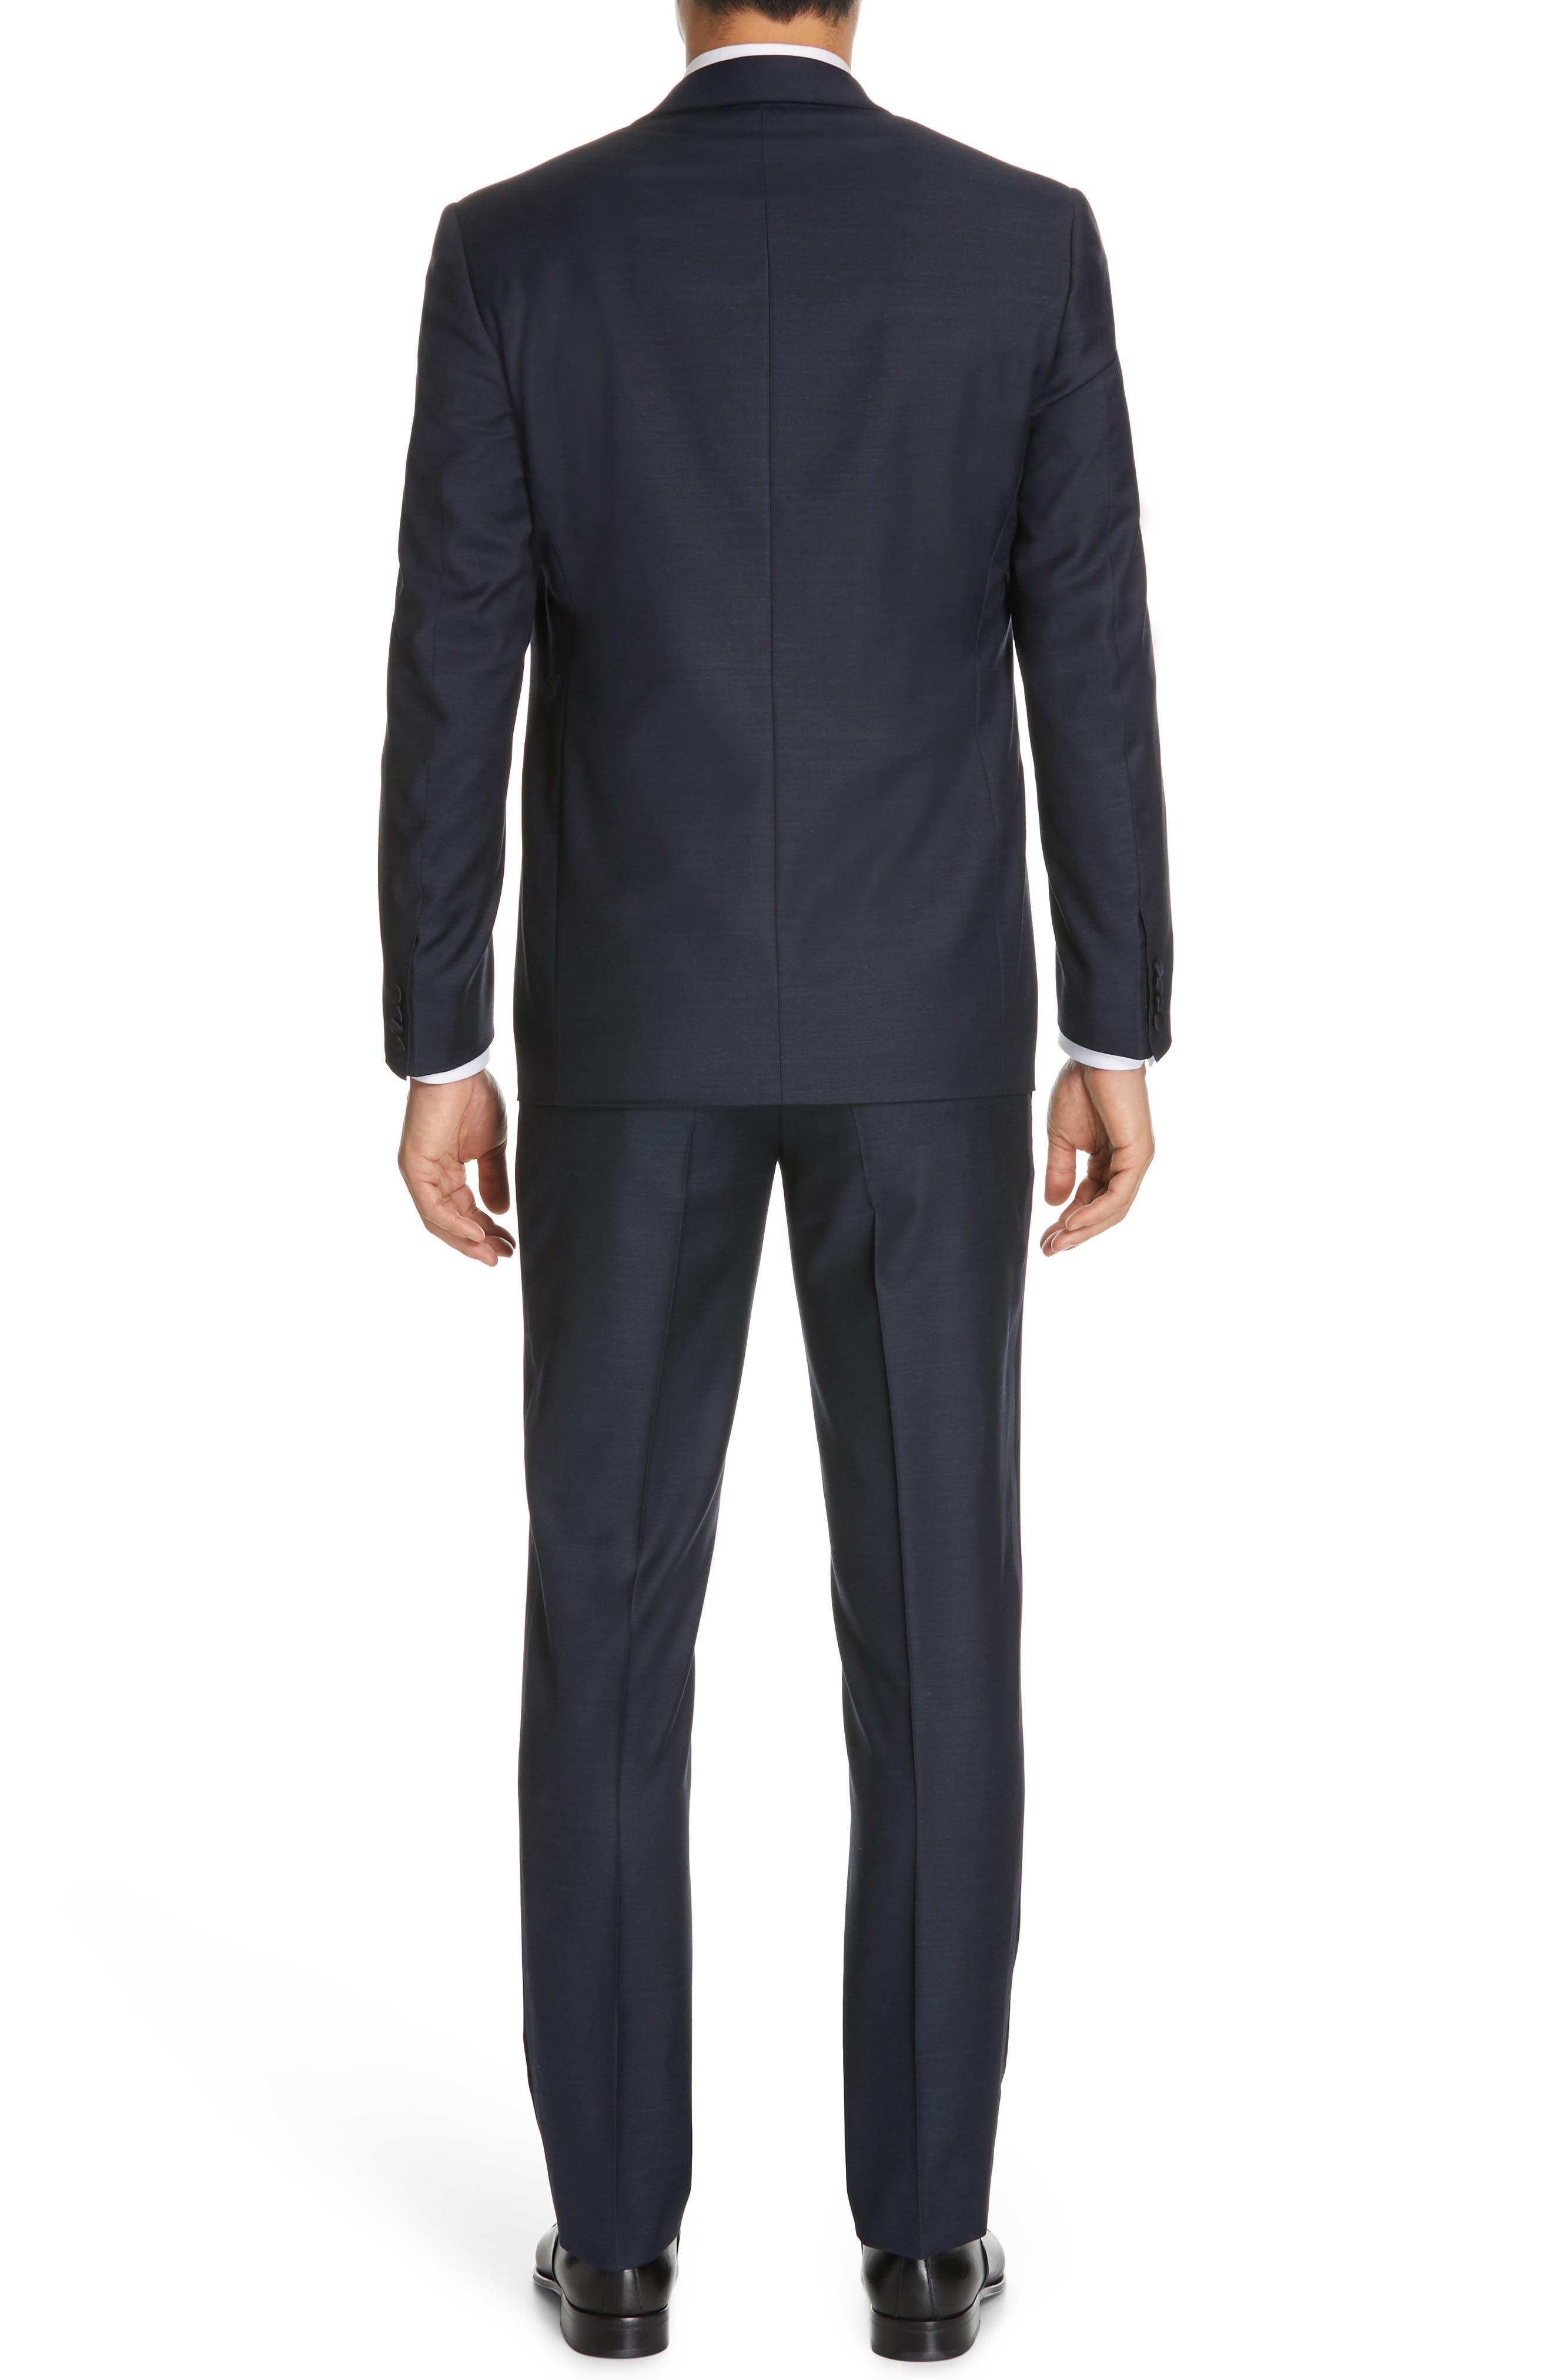 CANALI, Venieza Classic Fit Wool Tuxedo, Alternate thumbnail 2, color, NAVY